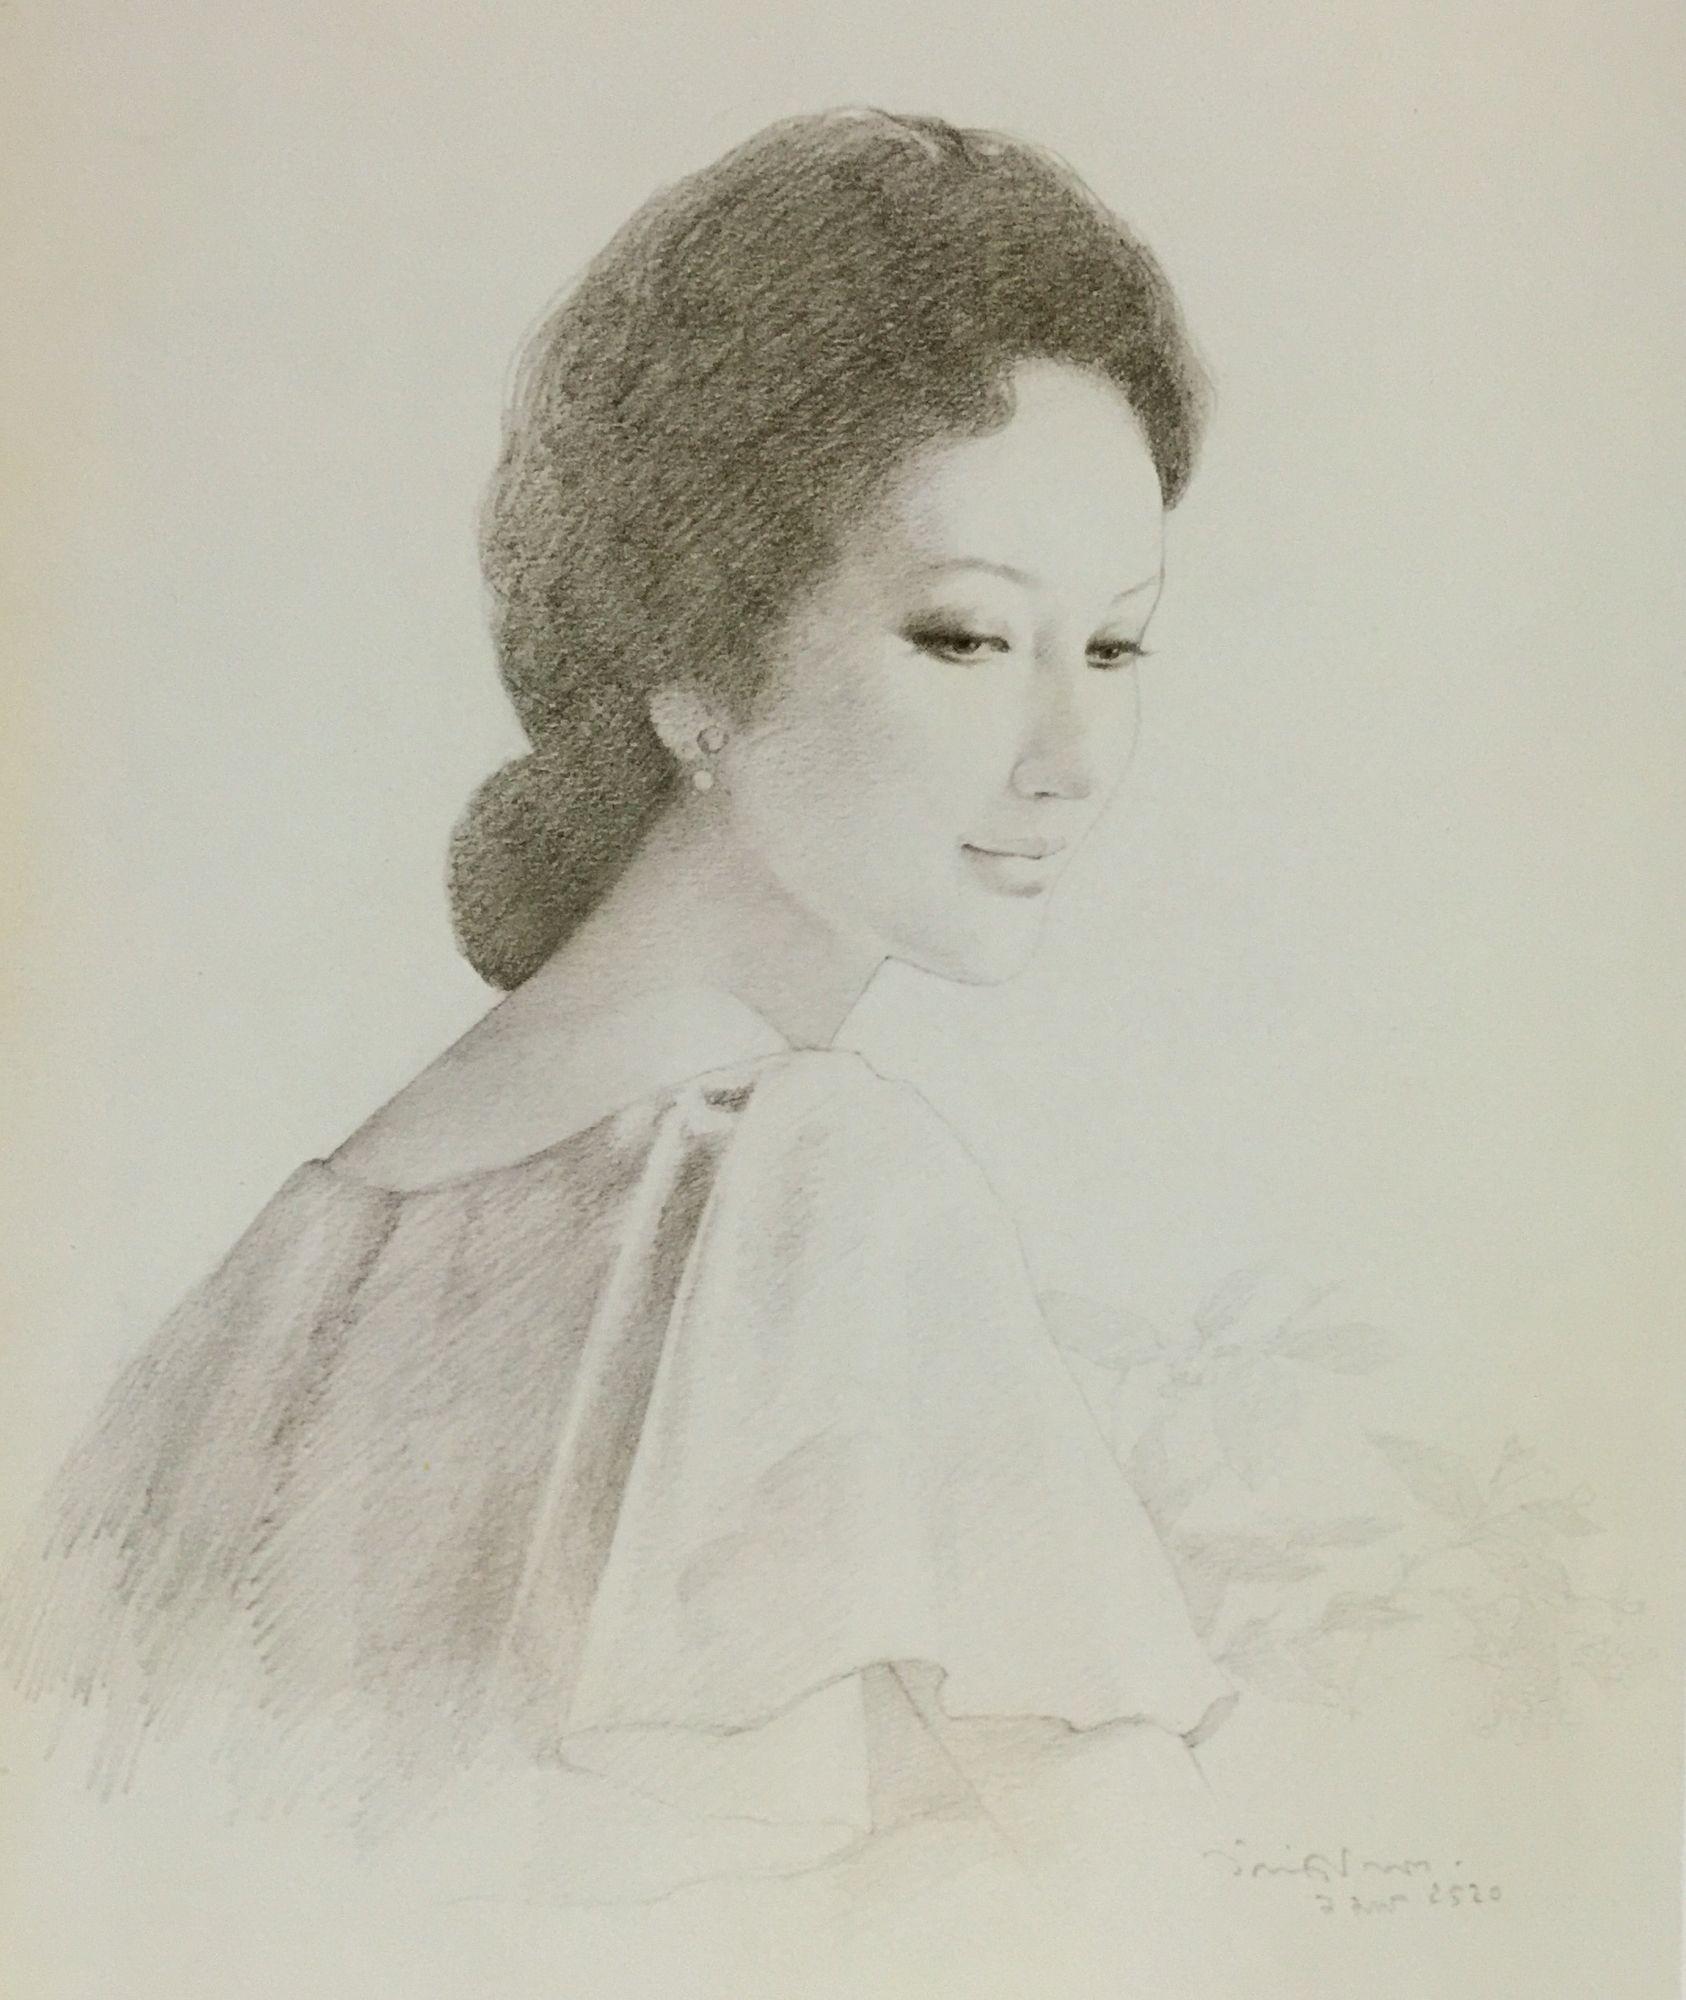 Pencil drawing, 1977, by Chakrabhand Posayakrit, a Thai national artist